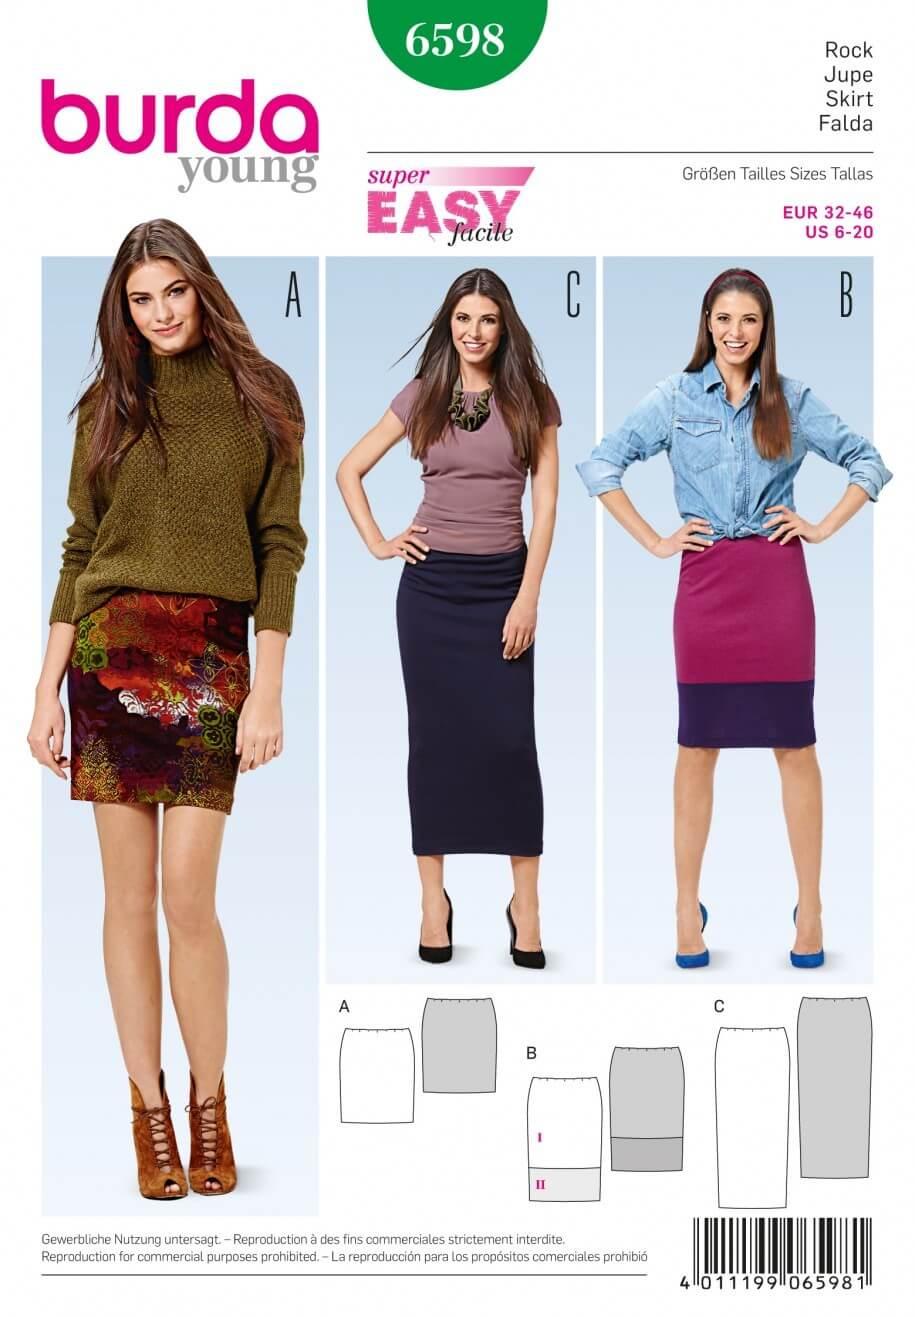 Burda Young Narrow Jersey Skirt Dress Sewing Pattern 6598